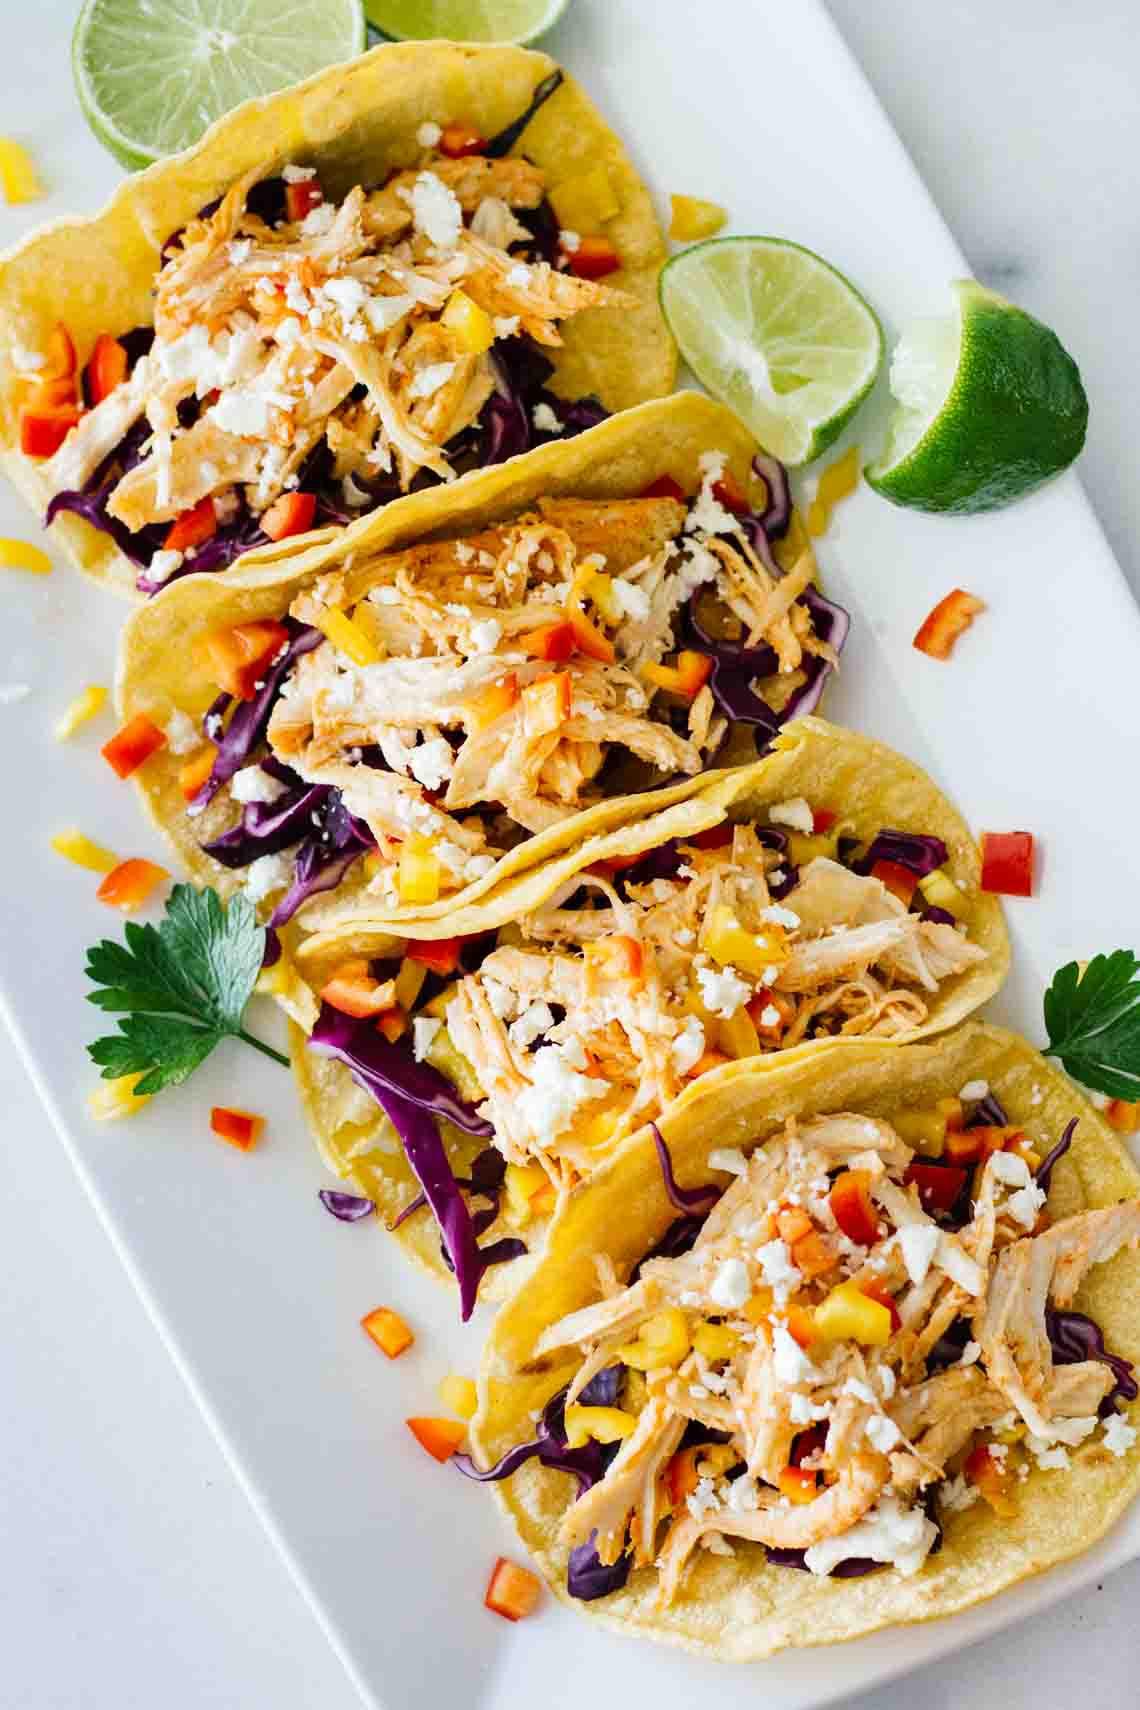 Easy Healthy Recipes For Dinner  Healthy Sriracha Shredded Chicken Tacos Jar Lemons